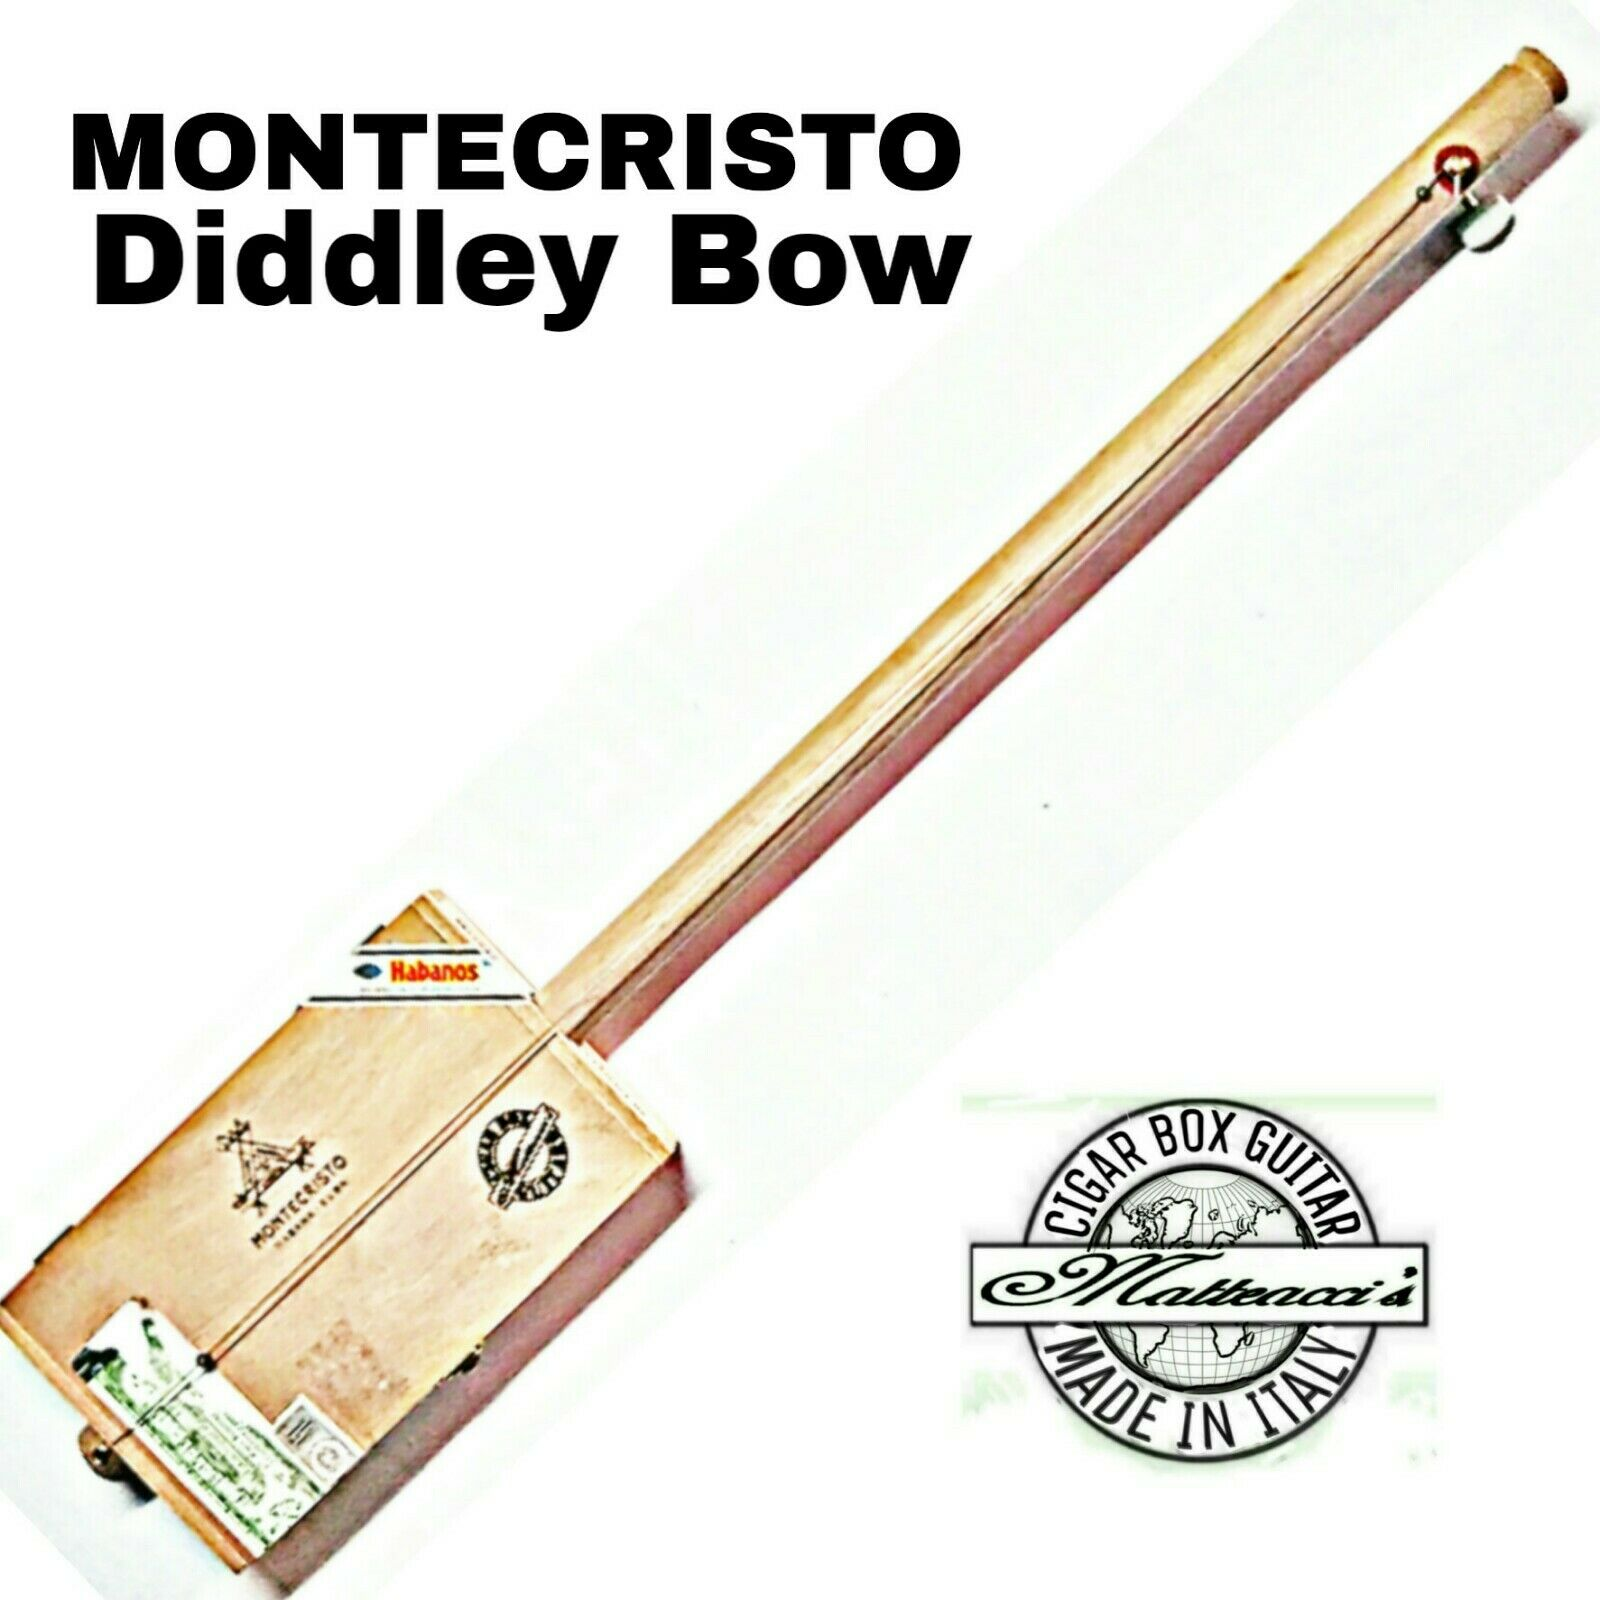 Cigar Box Guitar Montecristo Diddley bow one string. Robert Matteacci